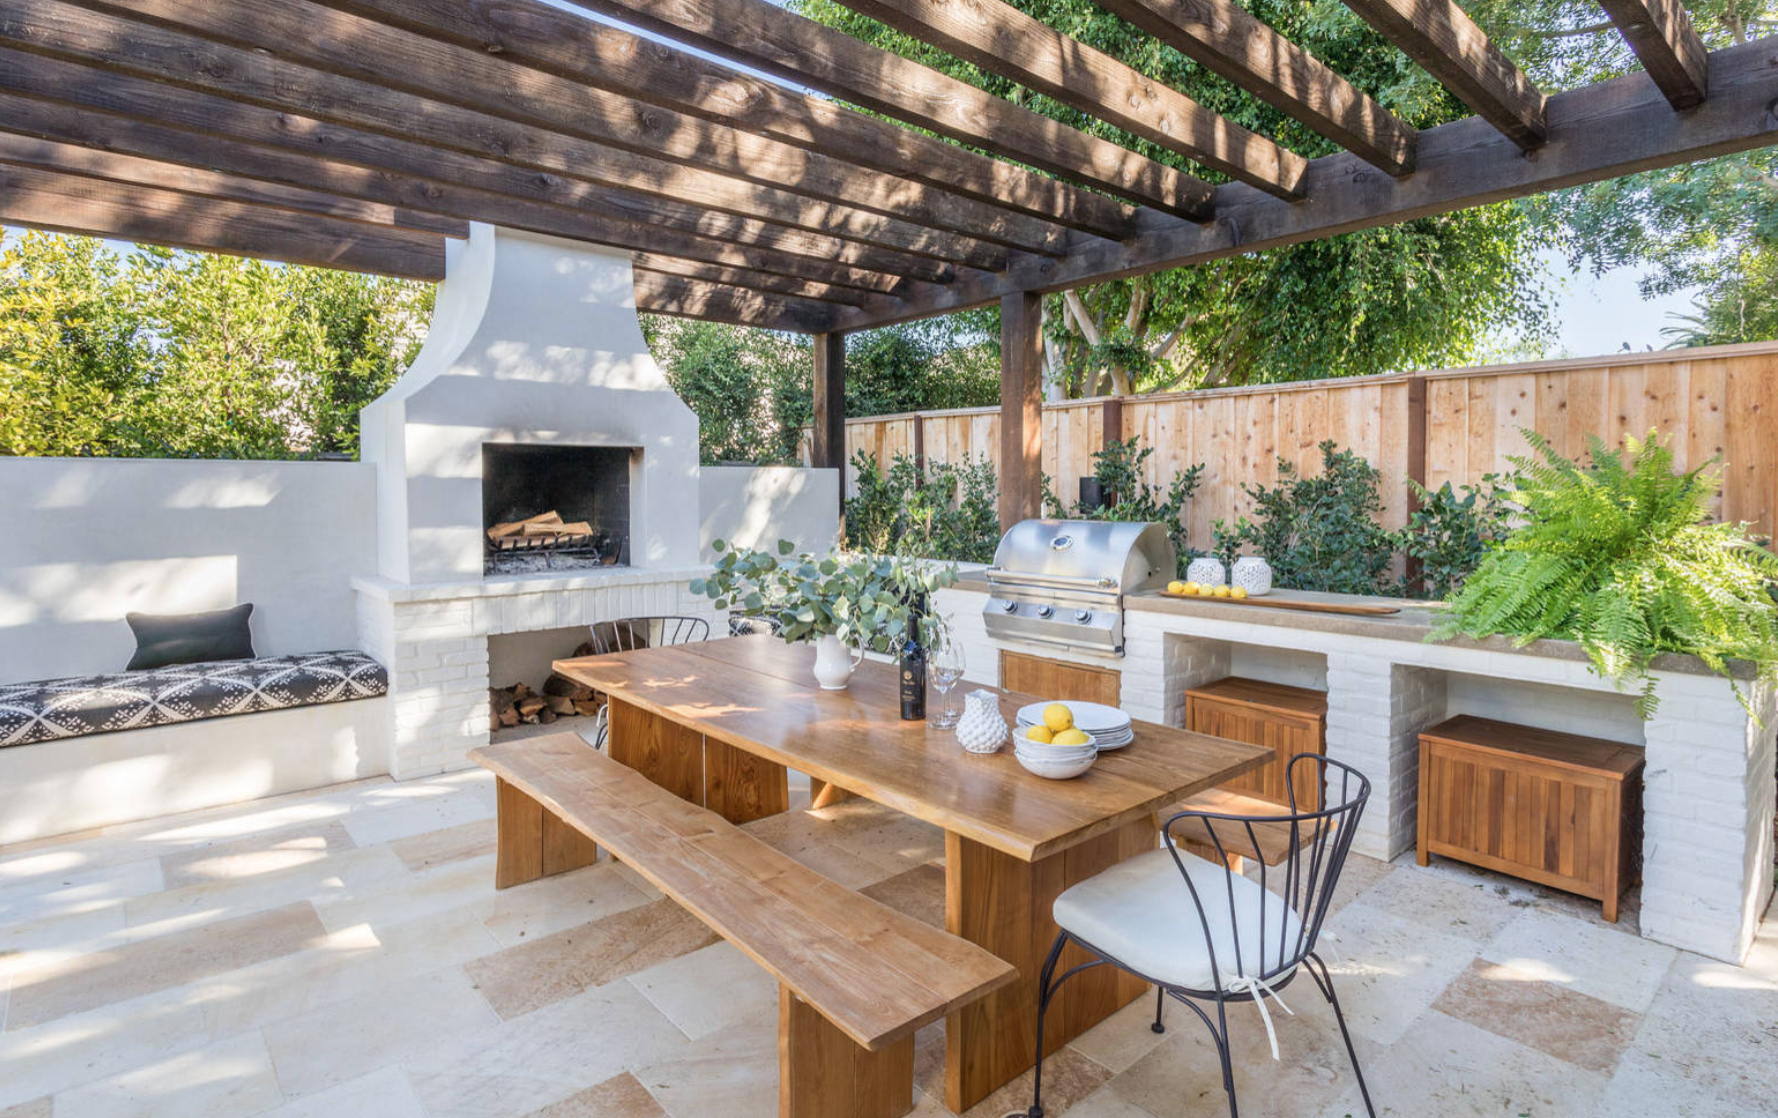 96 Pinterest Viral Outdoor Kitchen Designs And Tips Cozy Home 101 Outdoor Kitchen Design Pergola Patio Decor